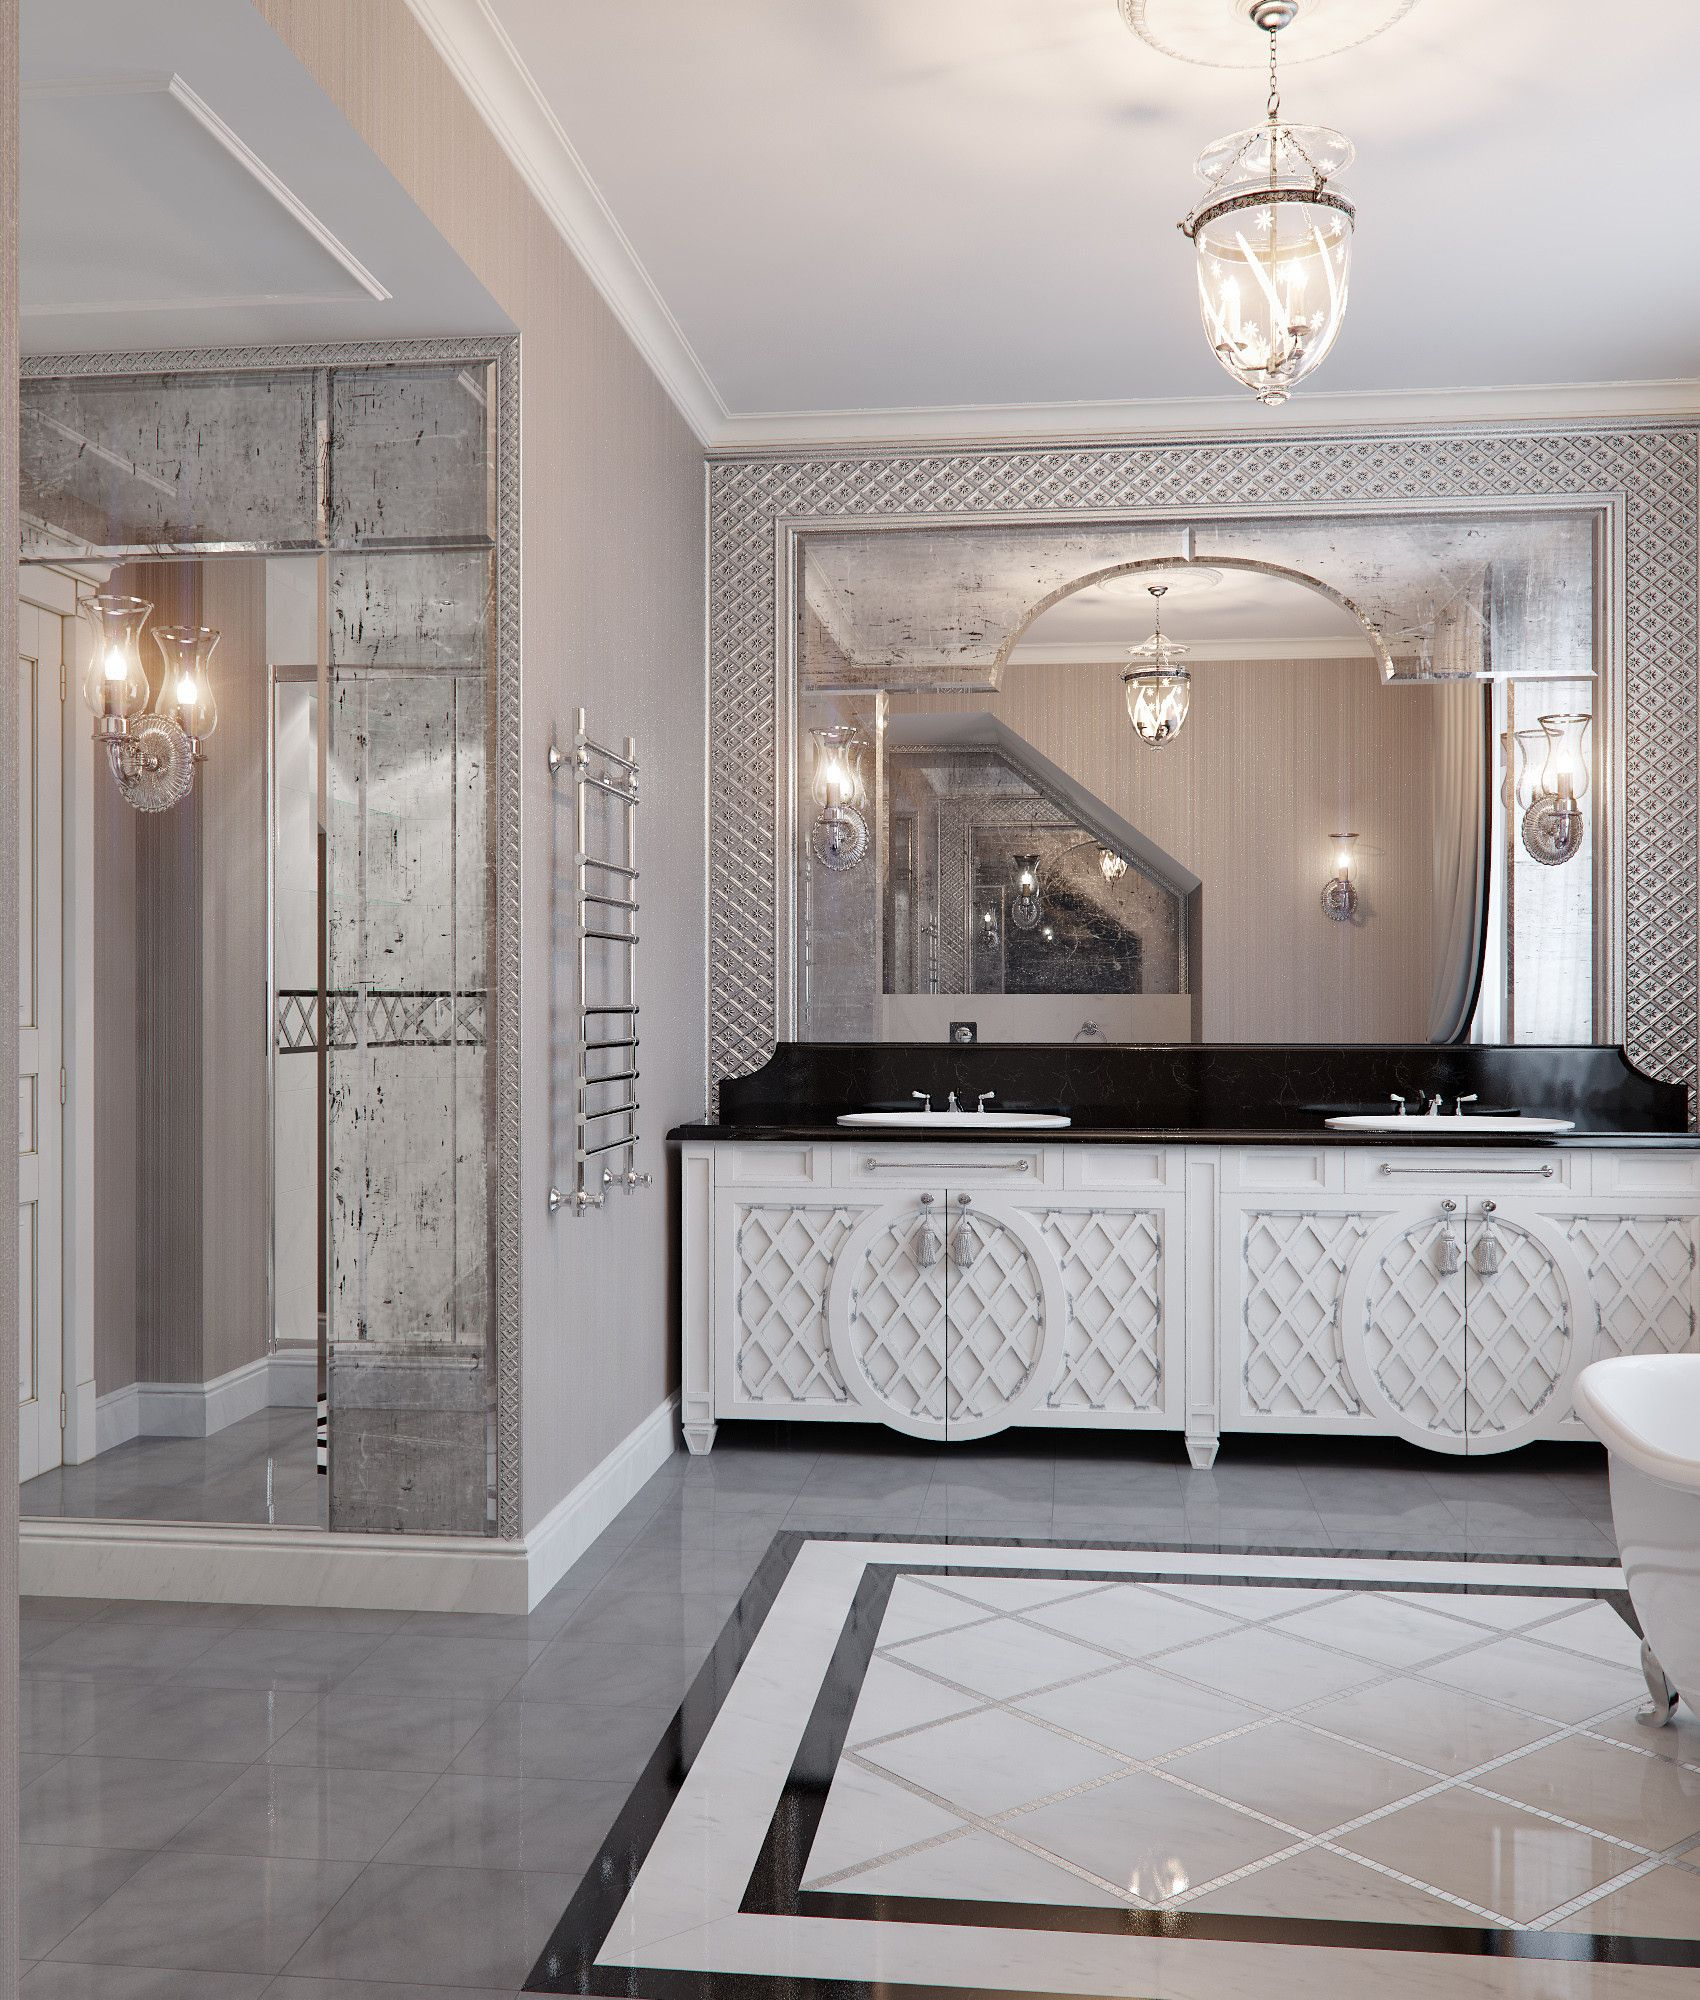 Entspannendes badezimmerdekor art deco scene bathroom d max  bad  pinterest